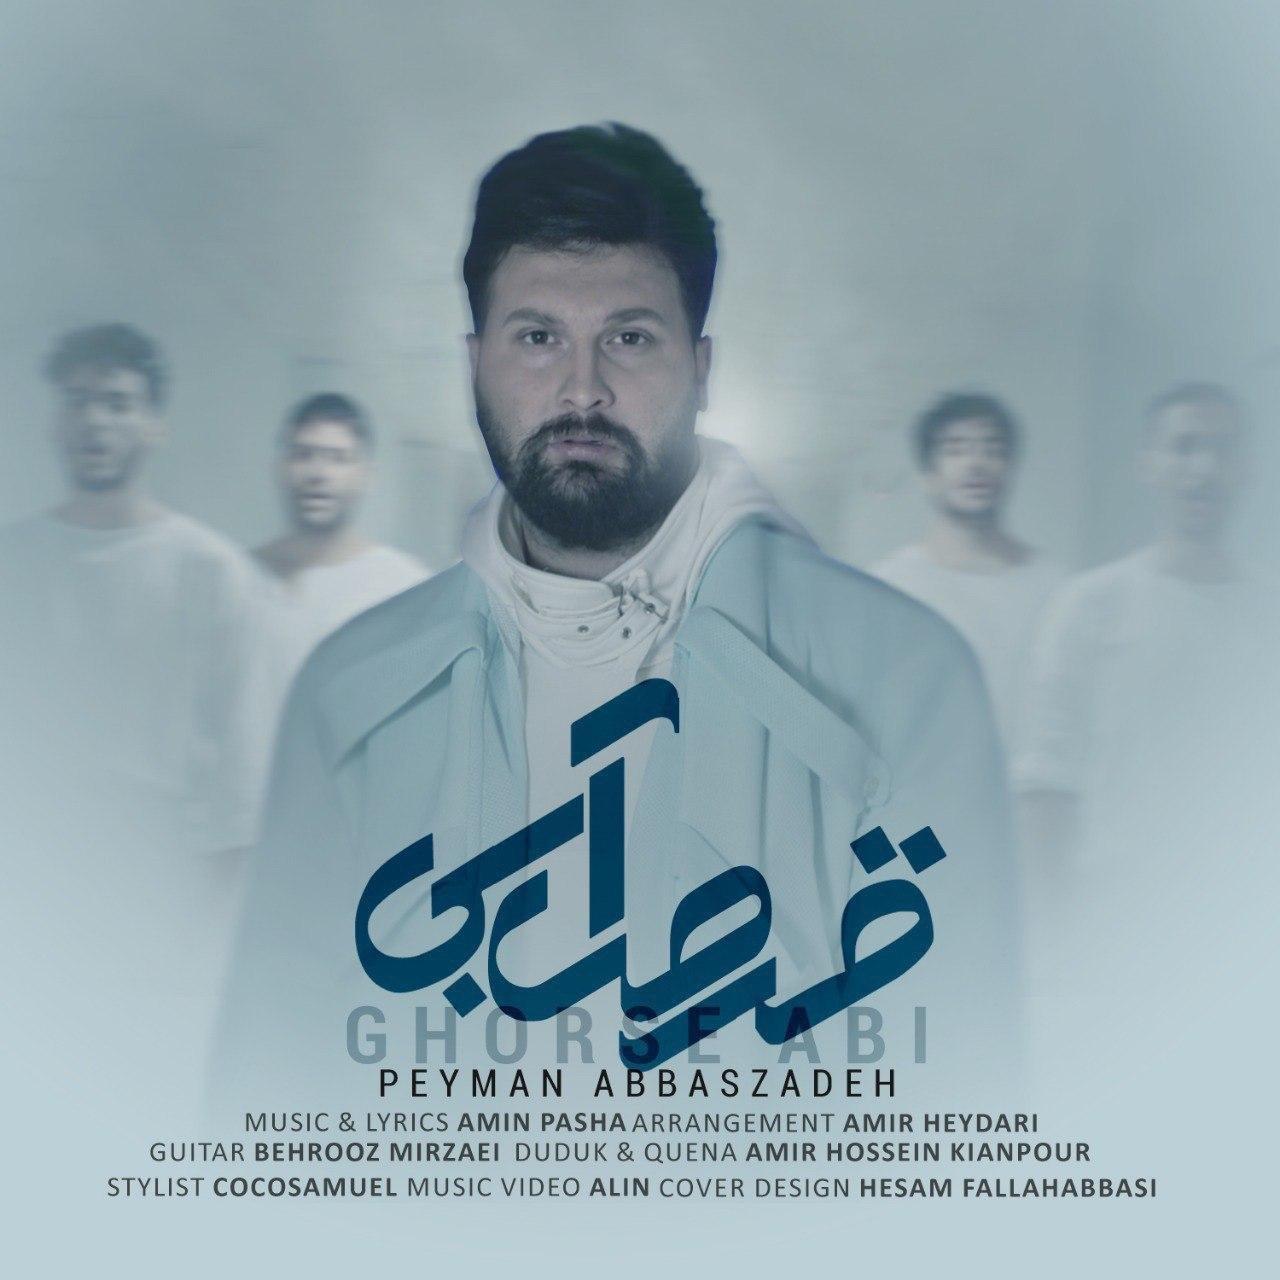 Peyman Abbaszadeh – Ghorse Abi